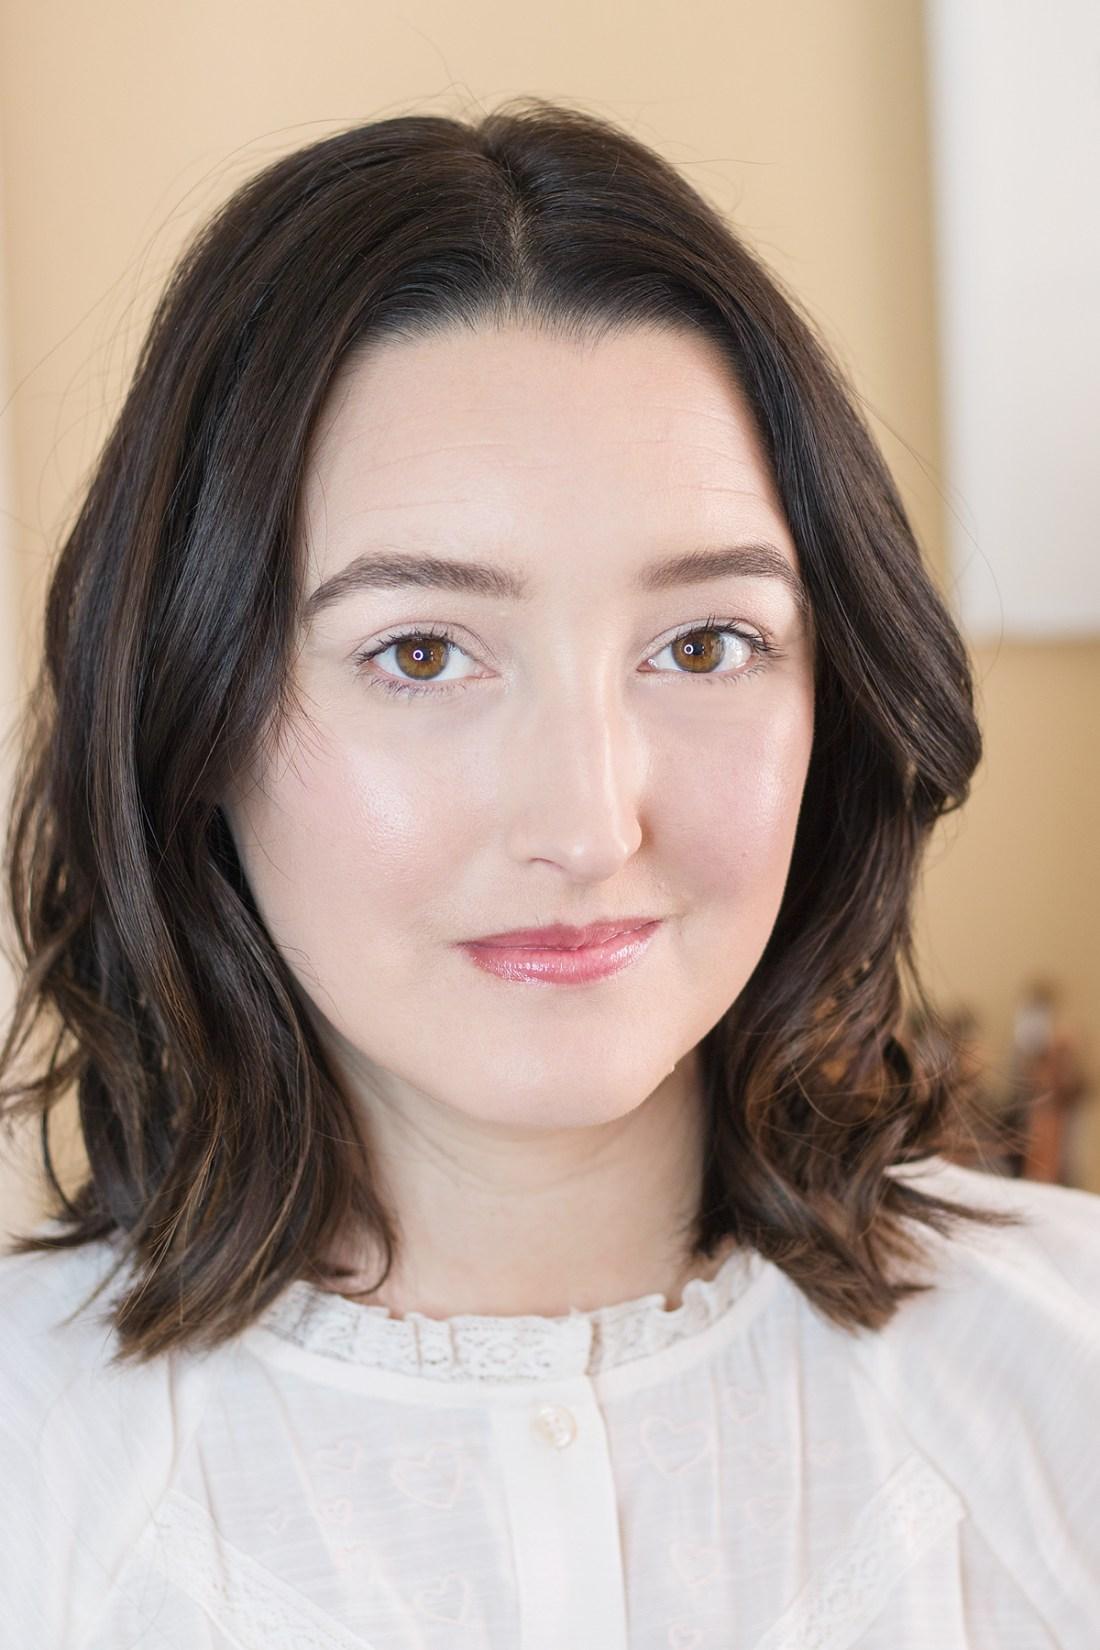 Natural Lightweight Foundation Makeup Look | A Good Hue